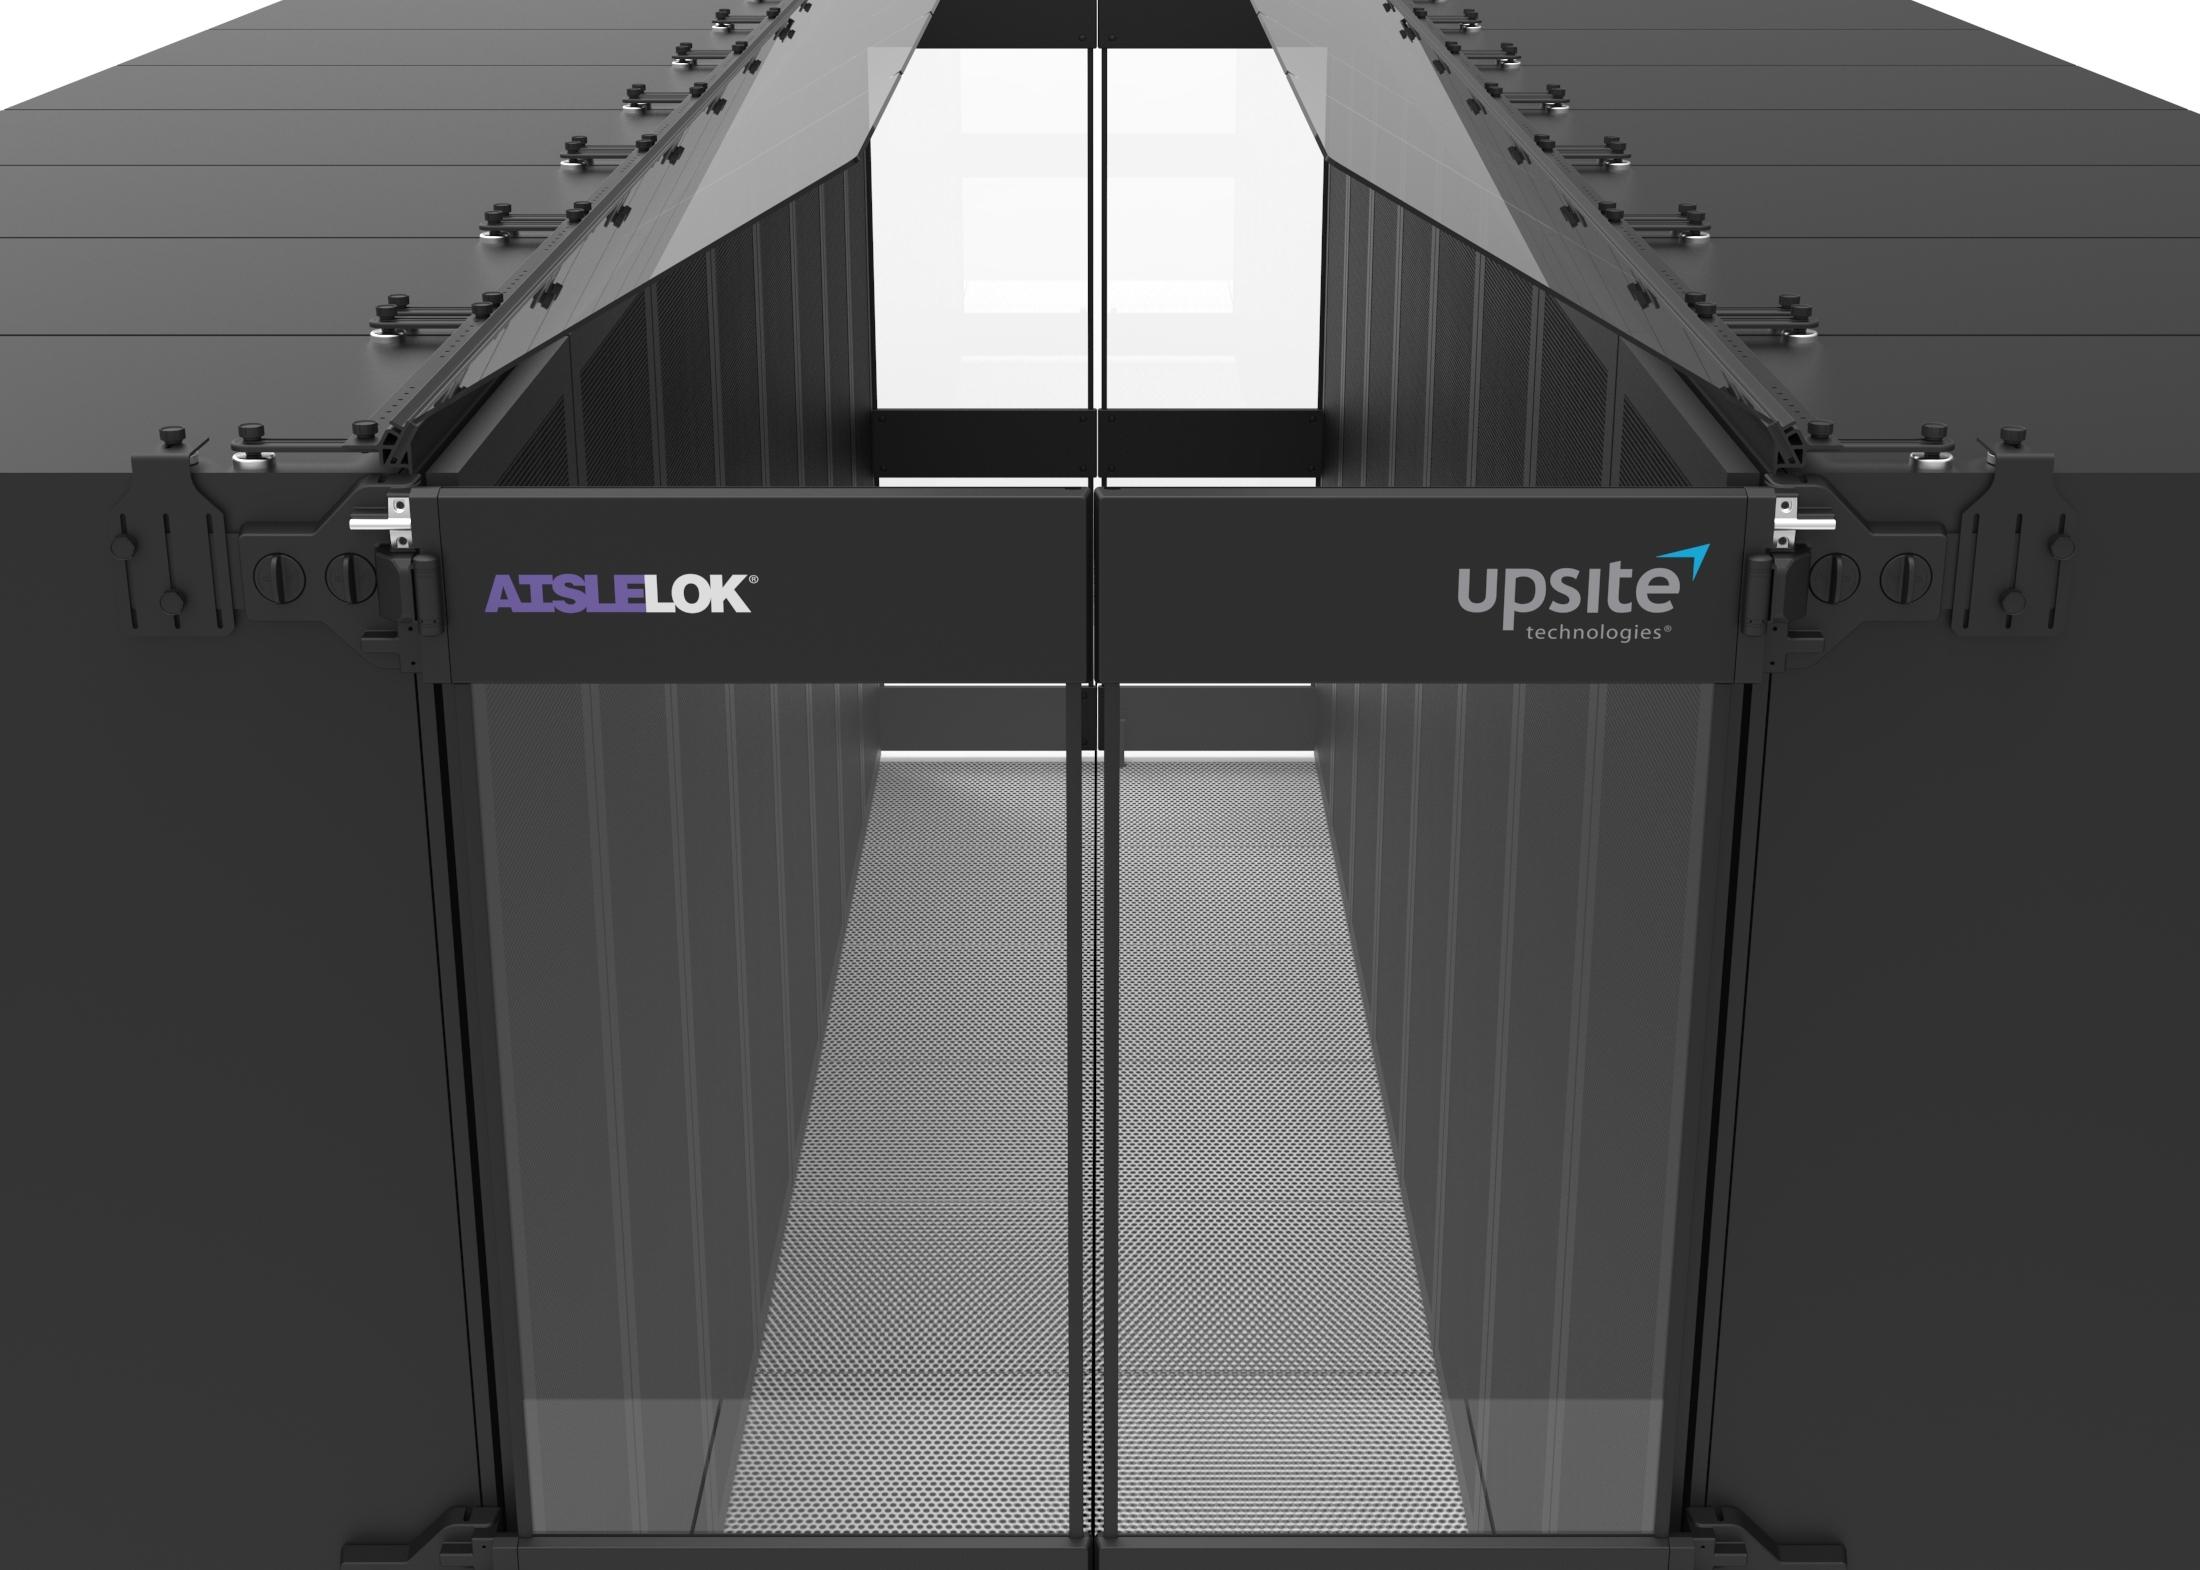 AisleLok Modular Containment (Photo: Business Wire)